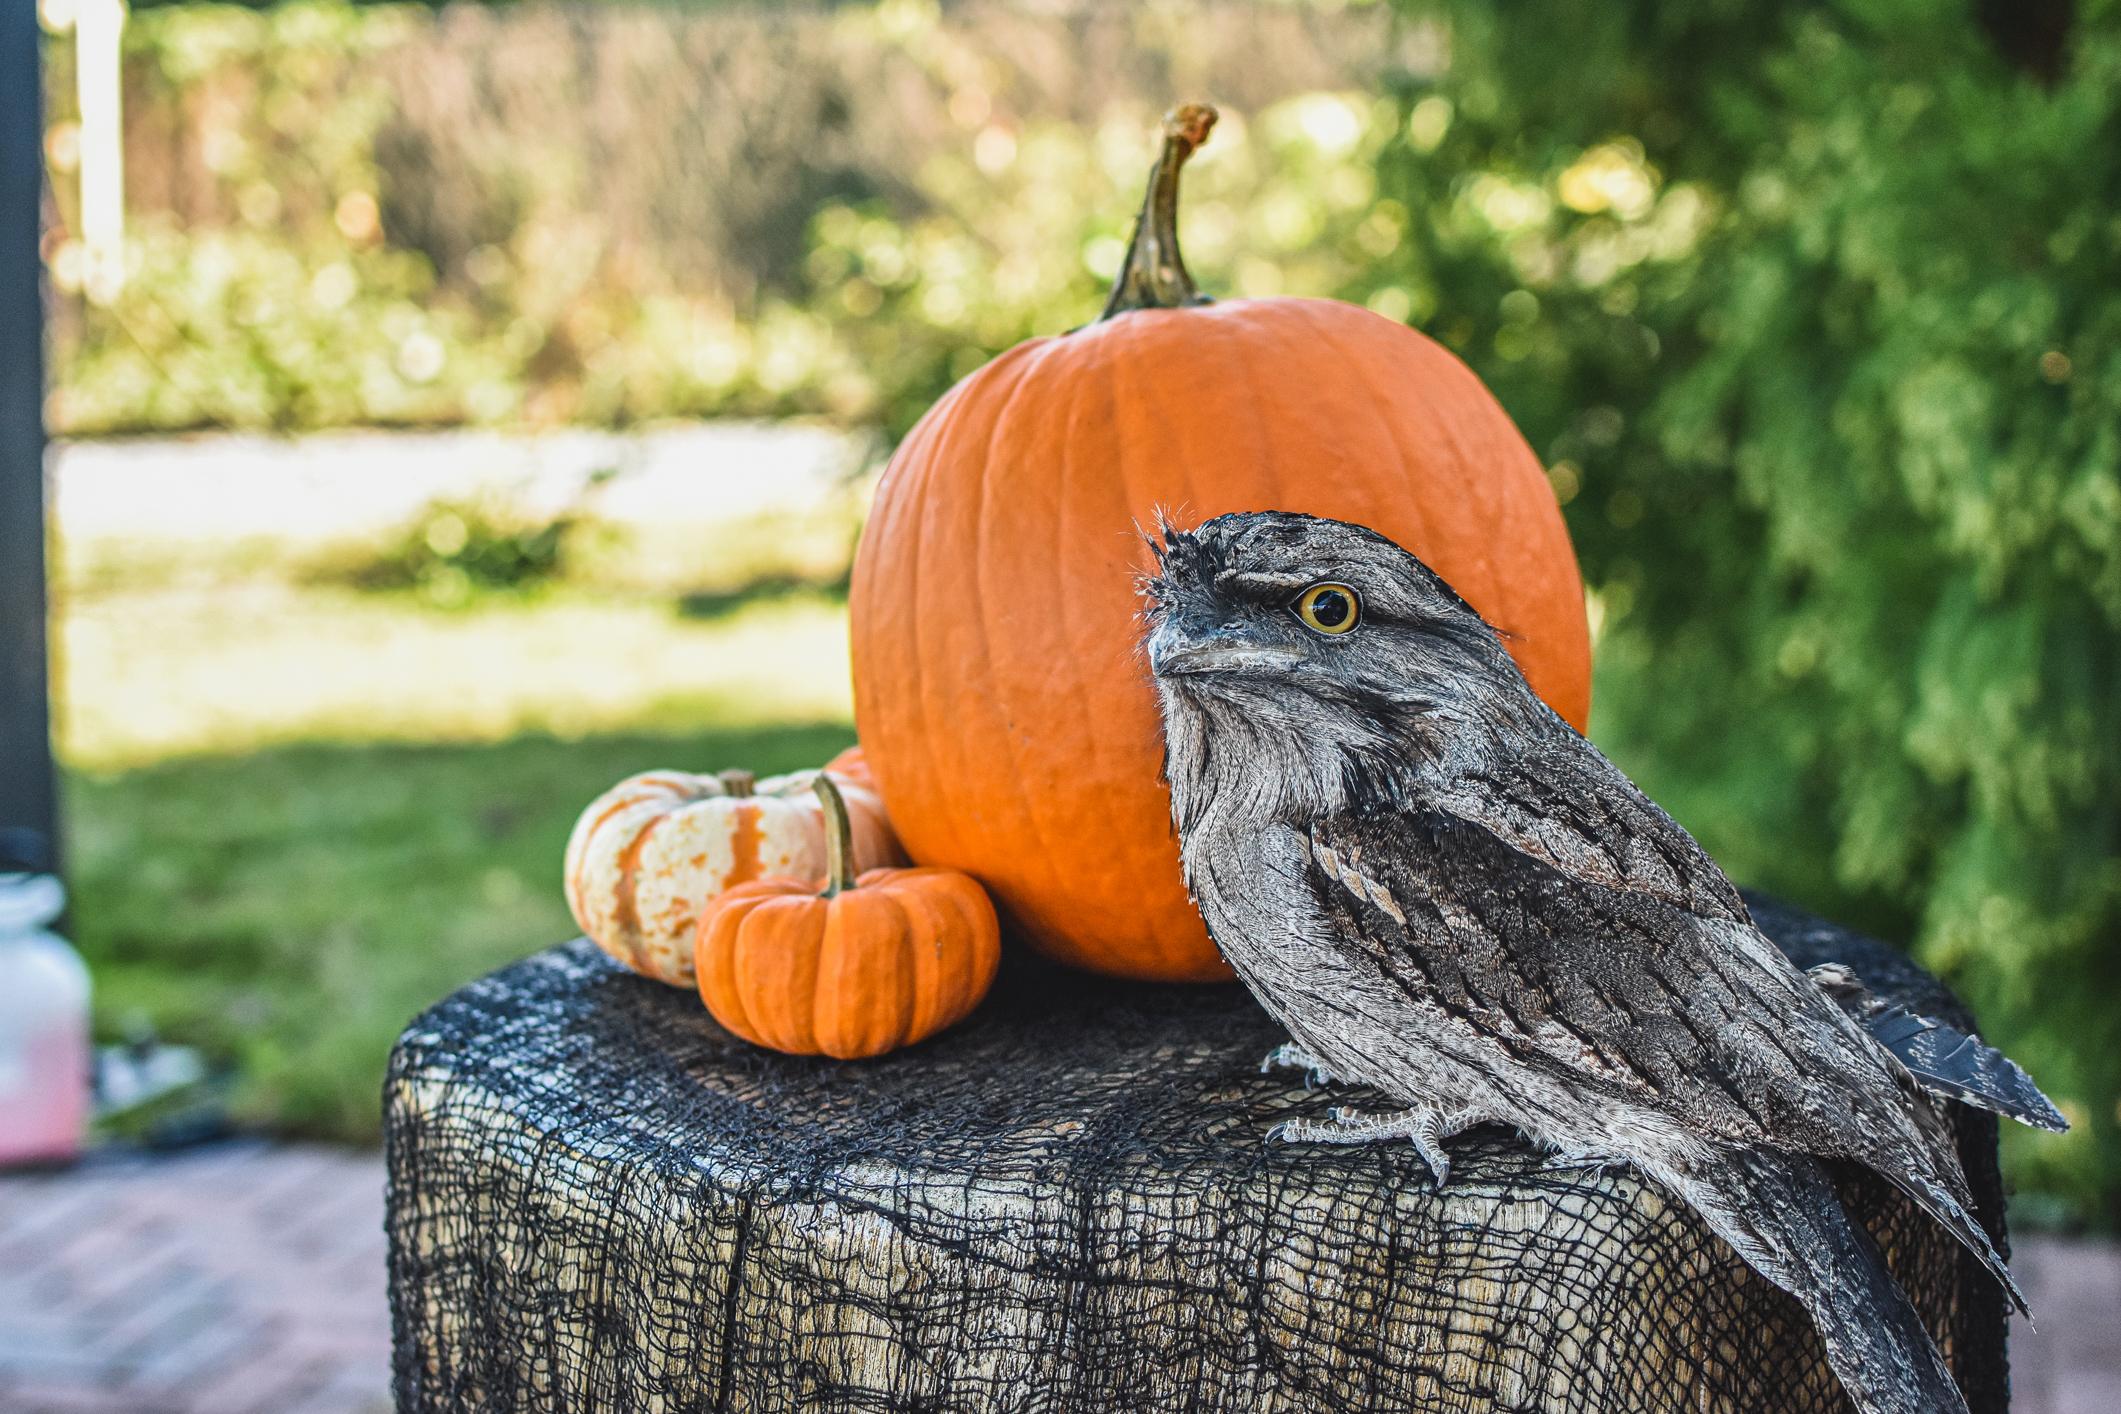 bird sitting next to pumpkins